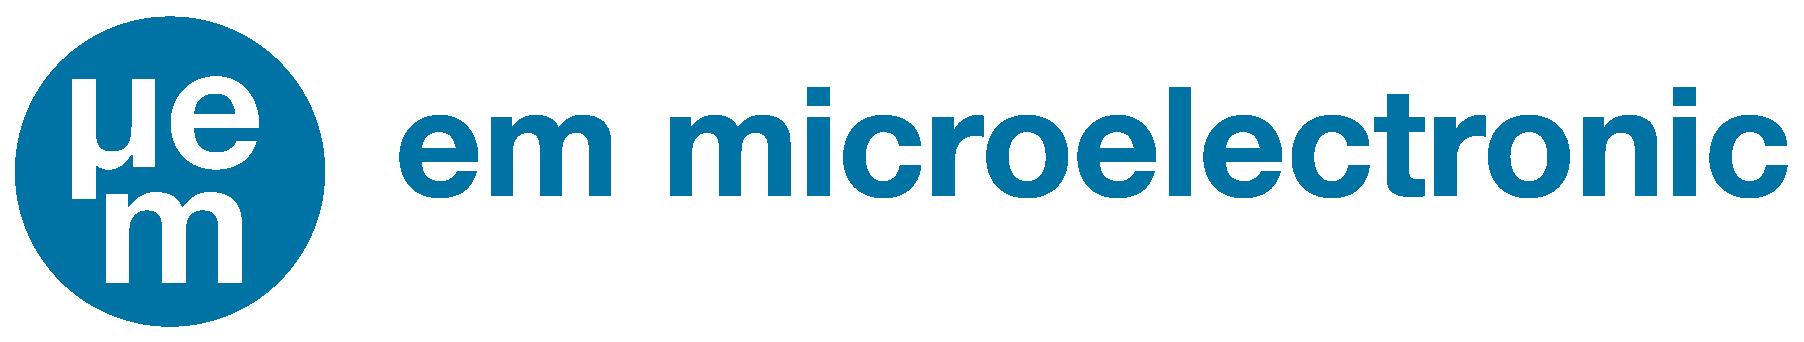 EM Microelectronic